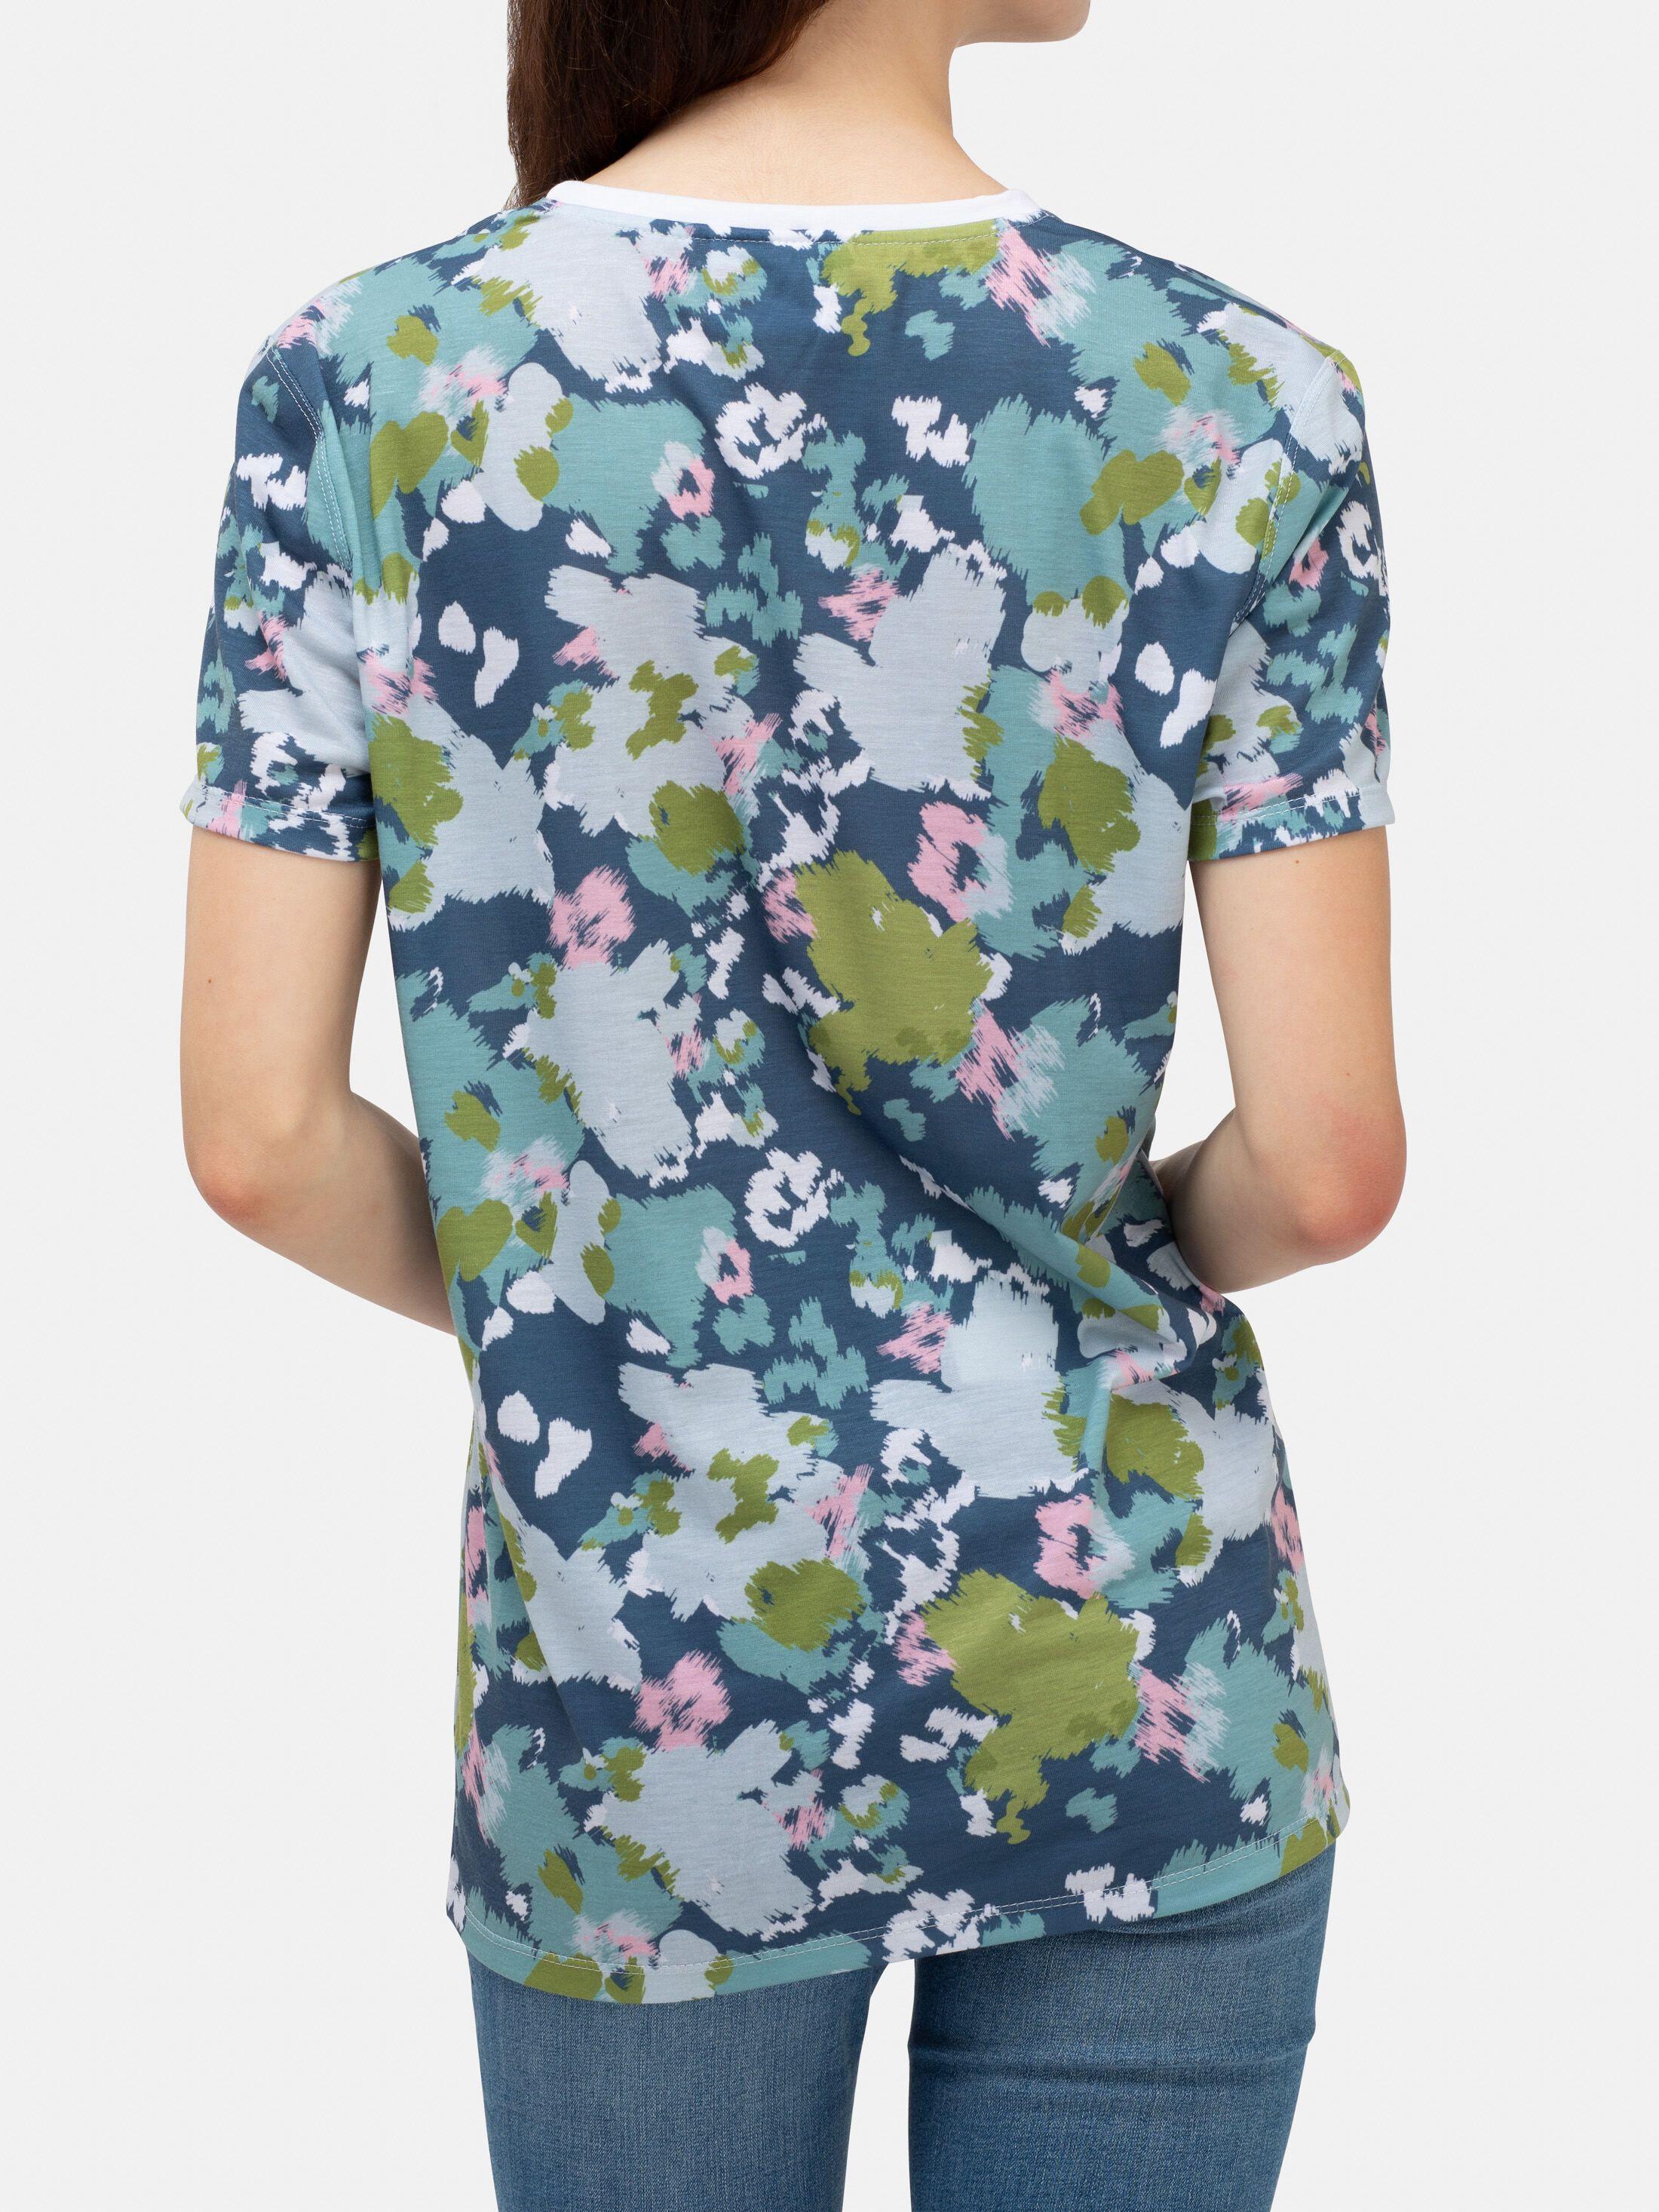 impresion continua camiseta personalizada bajo demanda